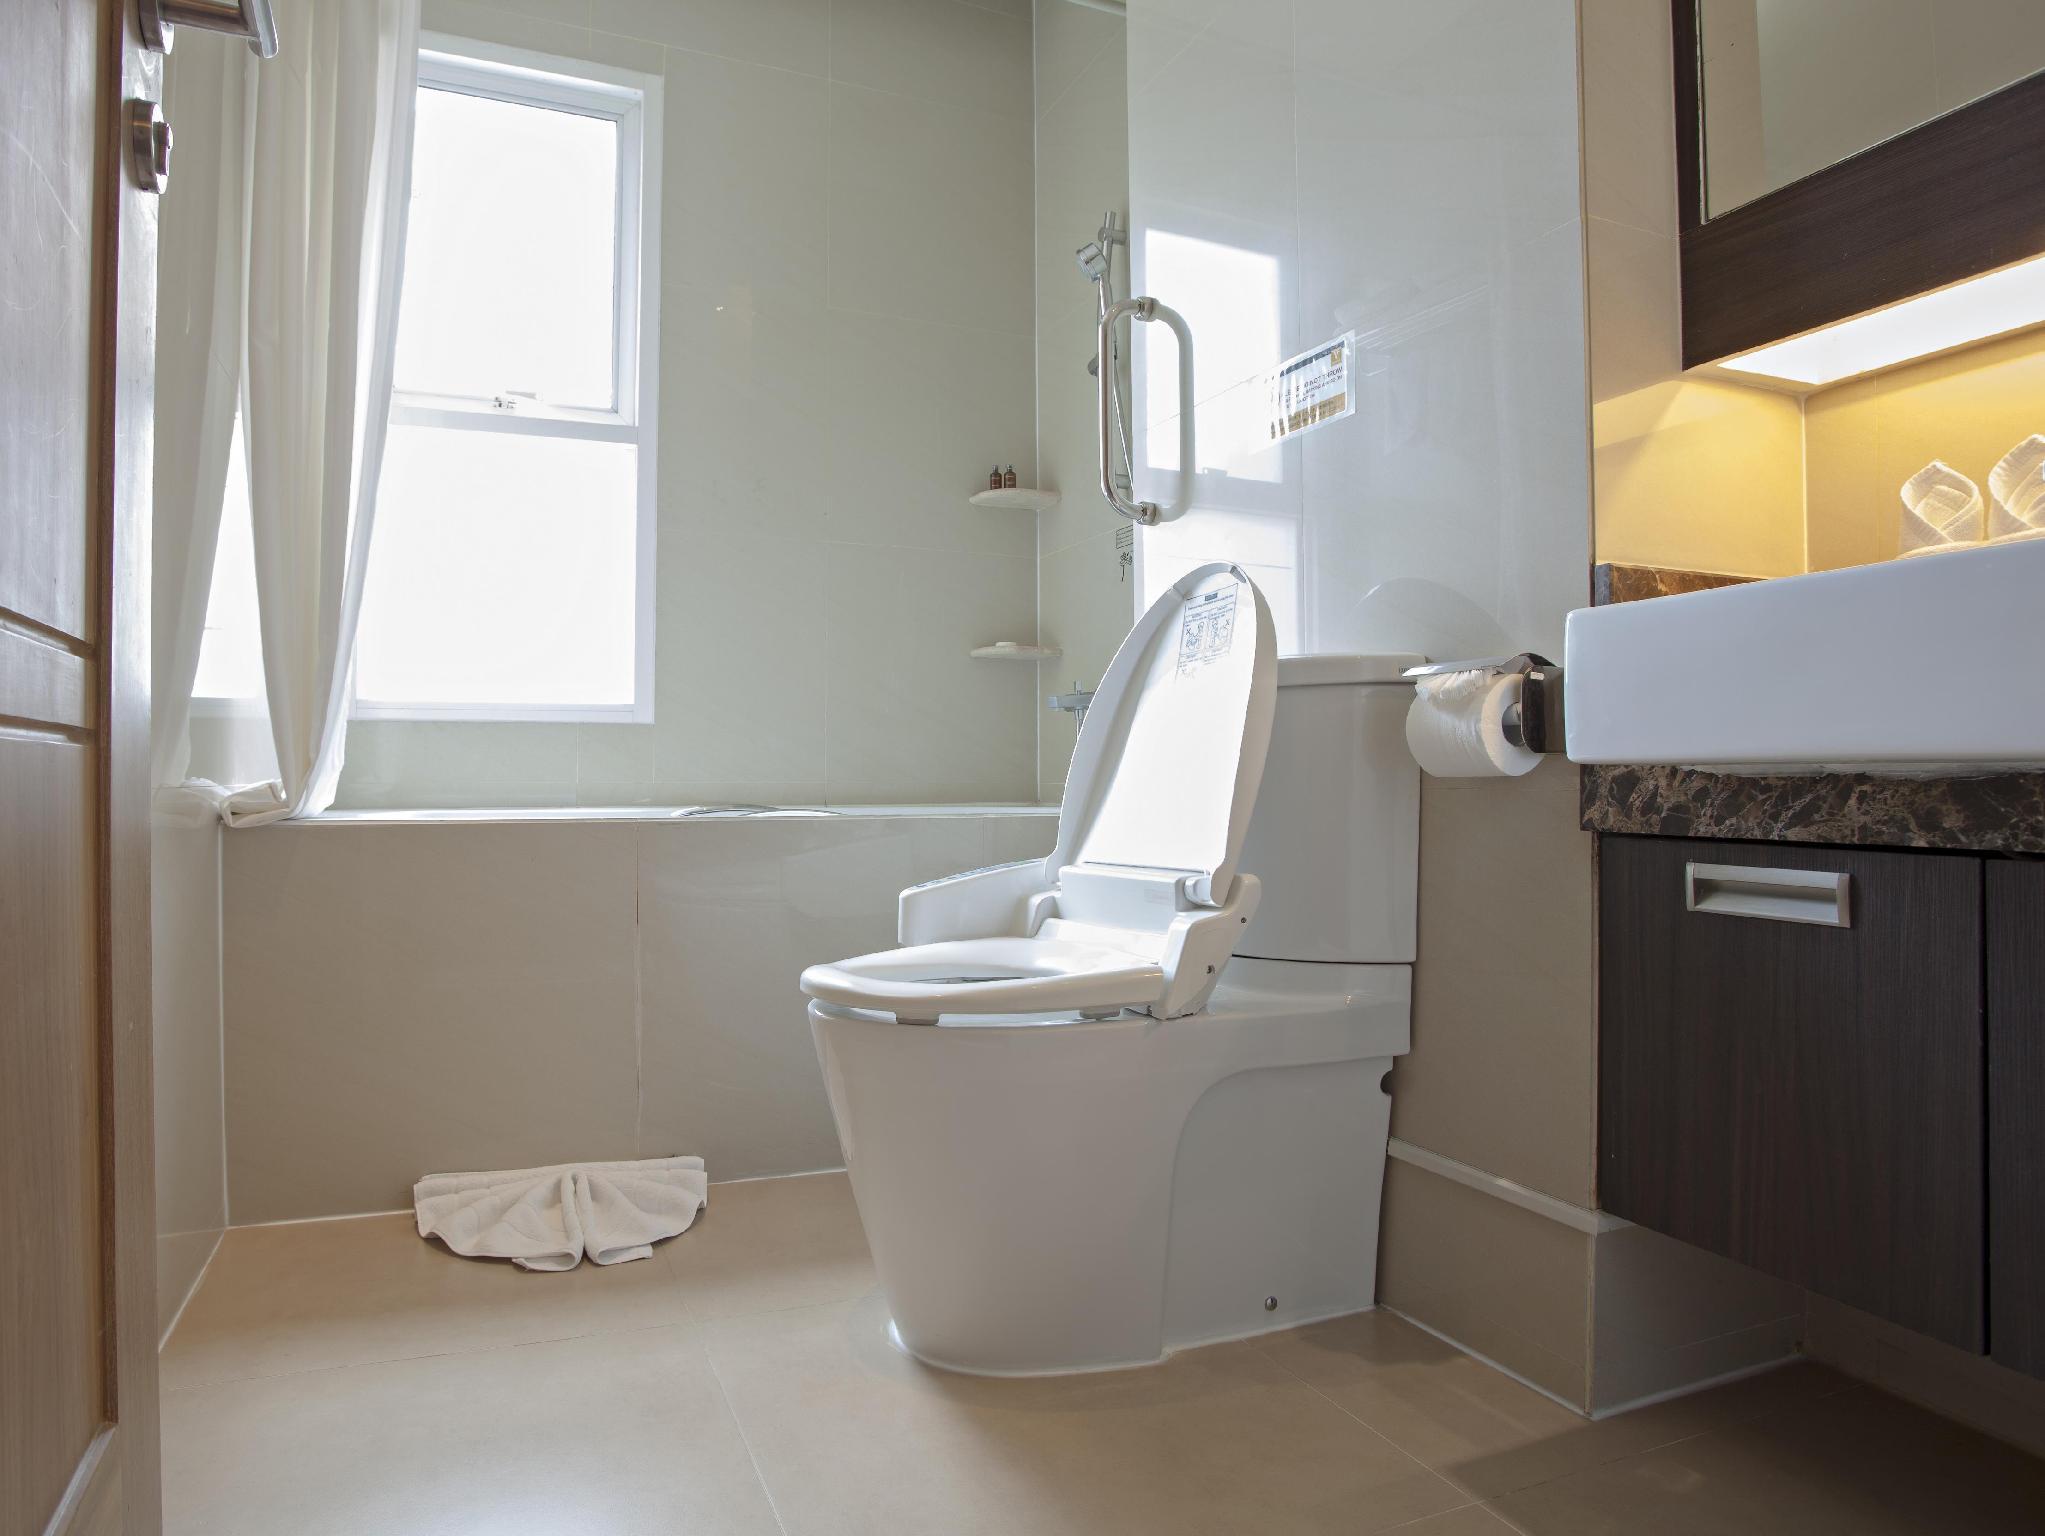 V レジデンス ホテル & サービスド アパートメント16